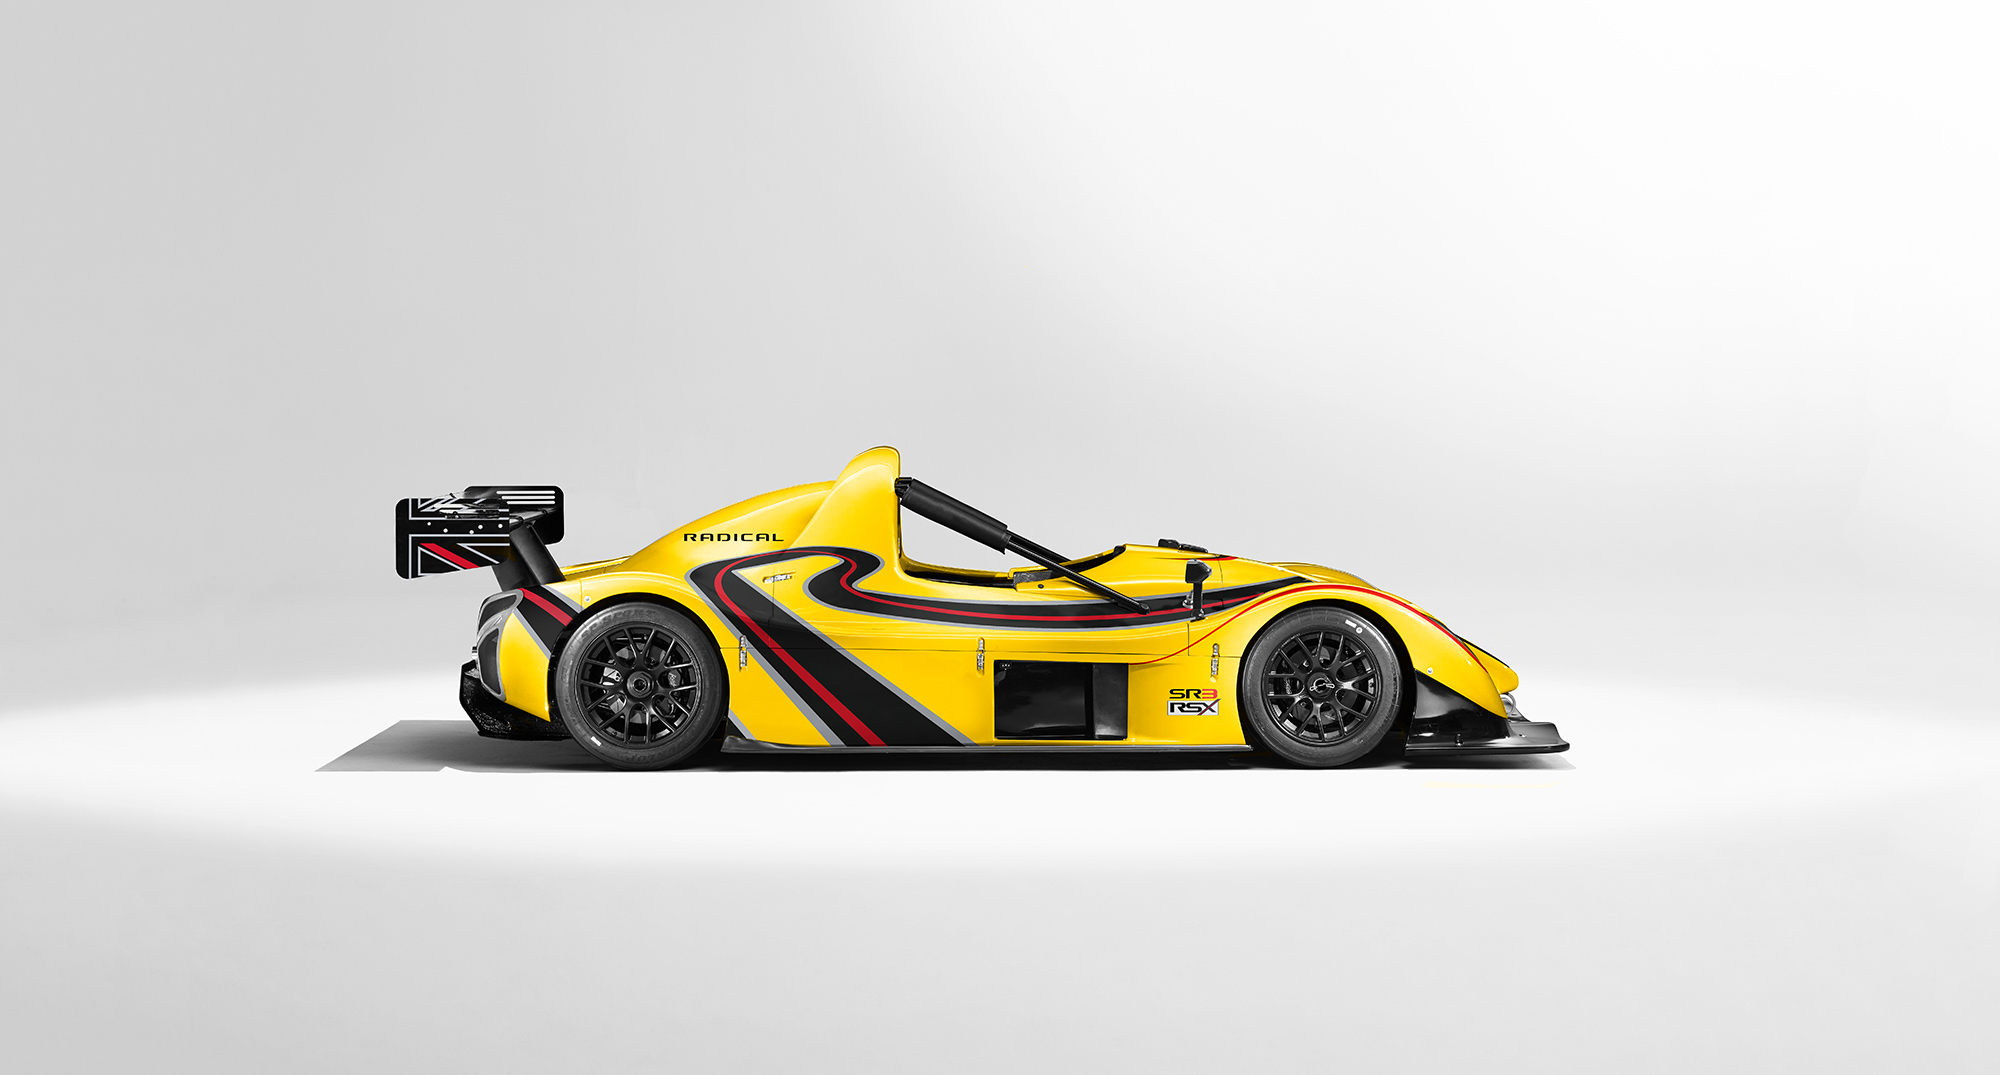 The-Allotment-Radical-Car-Yellow-V2